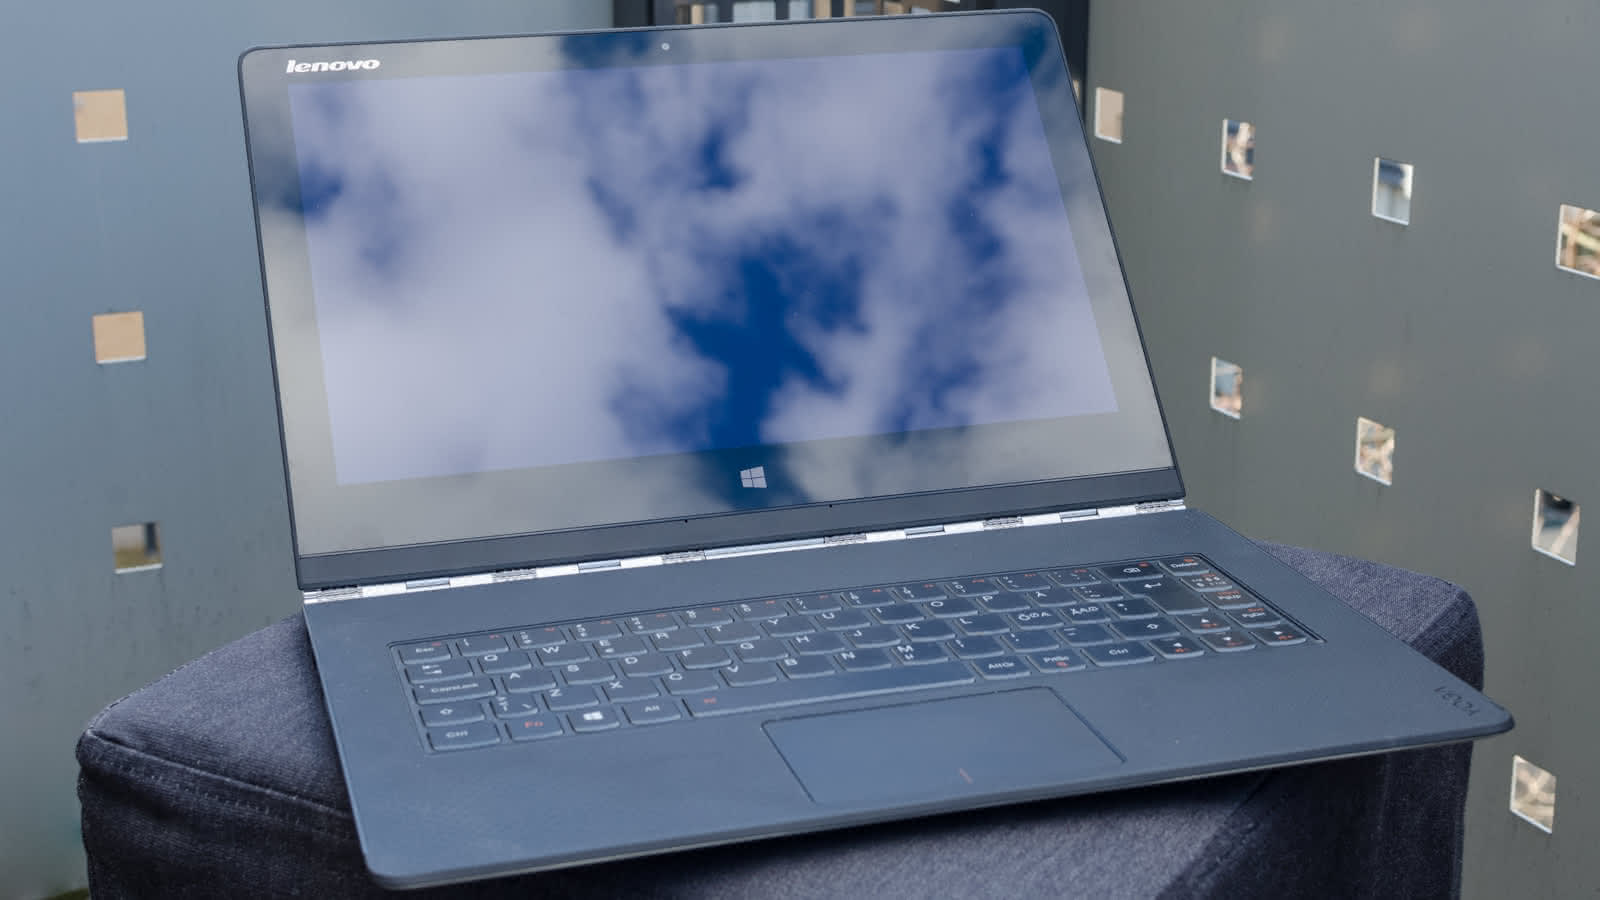 Run Linux on the Lenovo ThinkPad Carbon X1 (5th generation